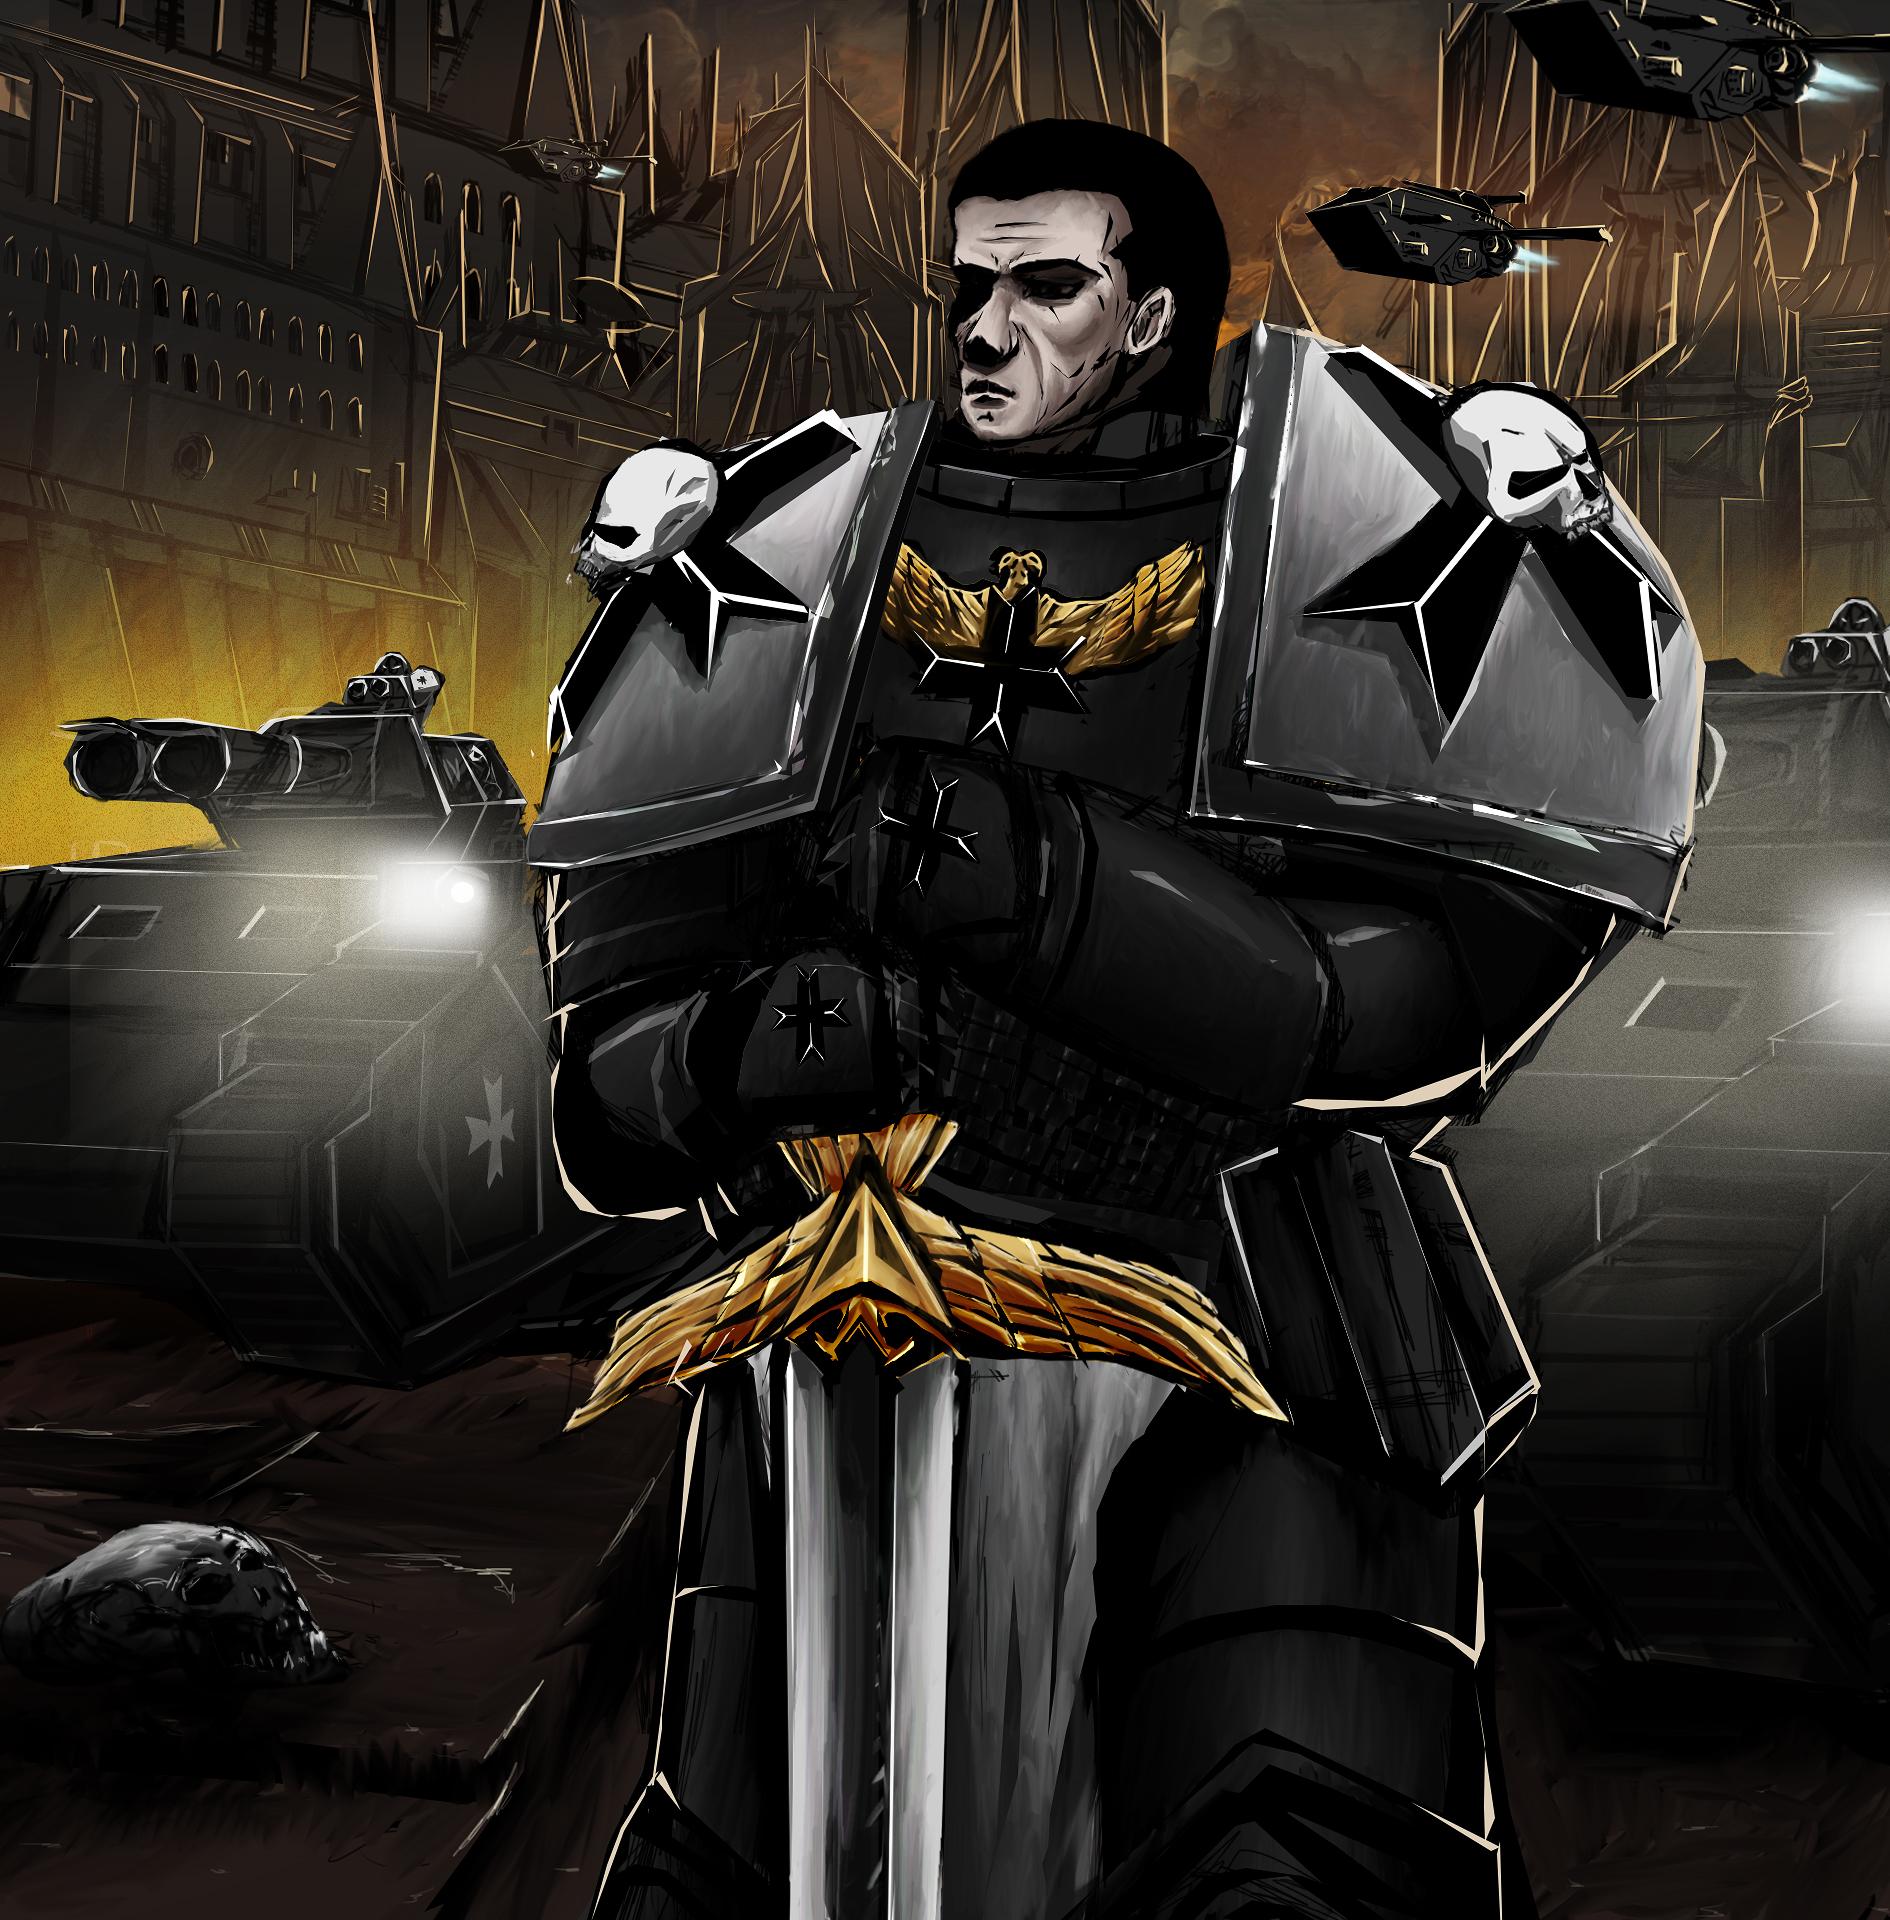 Black Templar (Self-portrait!)